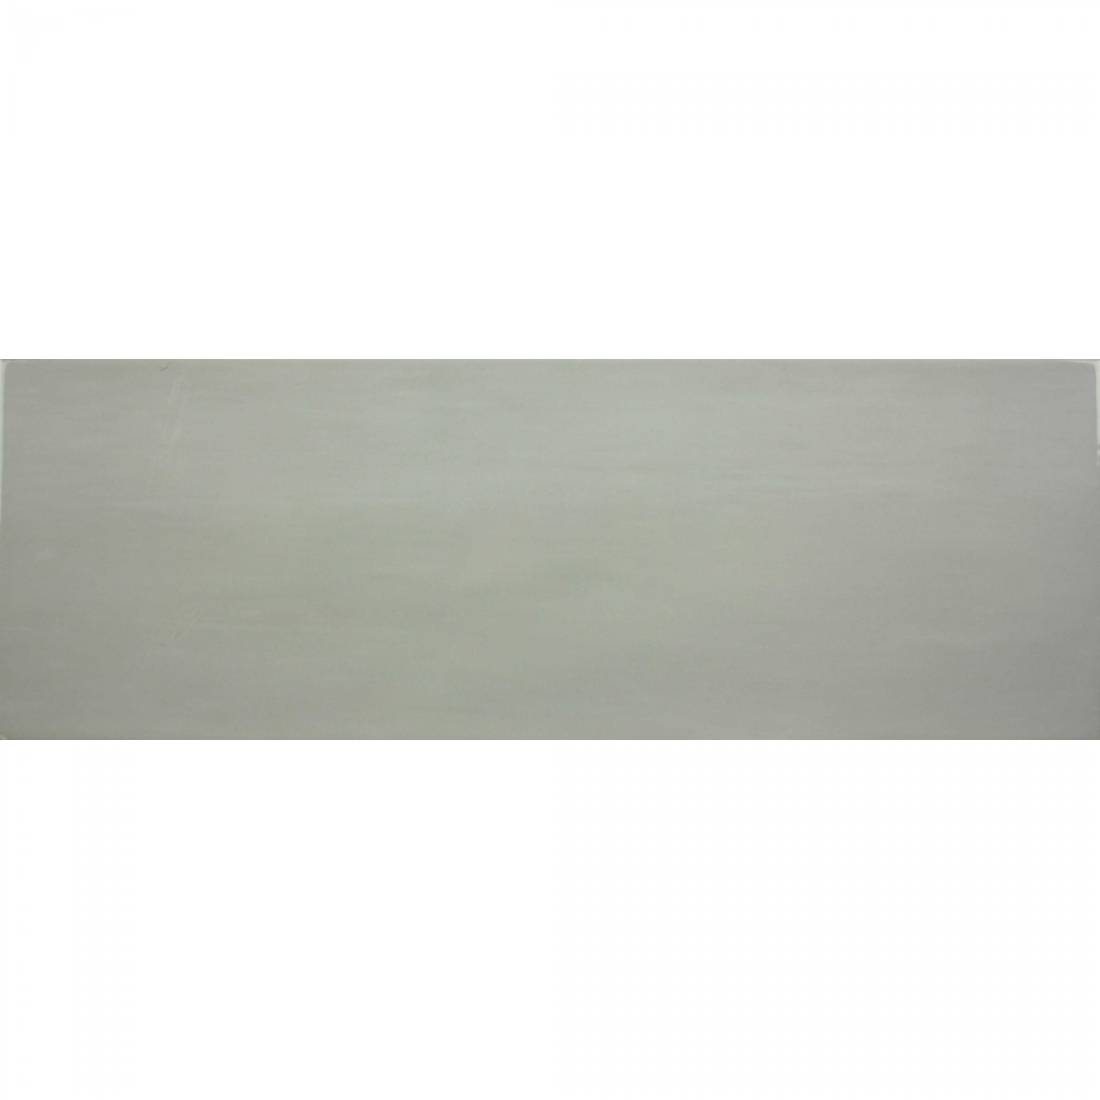 Arlette 21.4x61 Gris Gloss 1